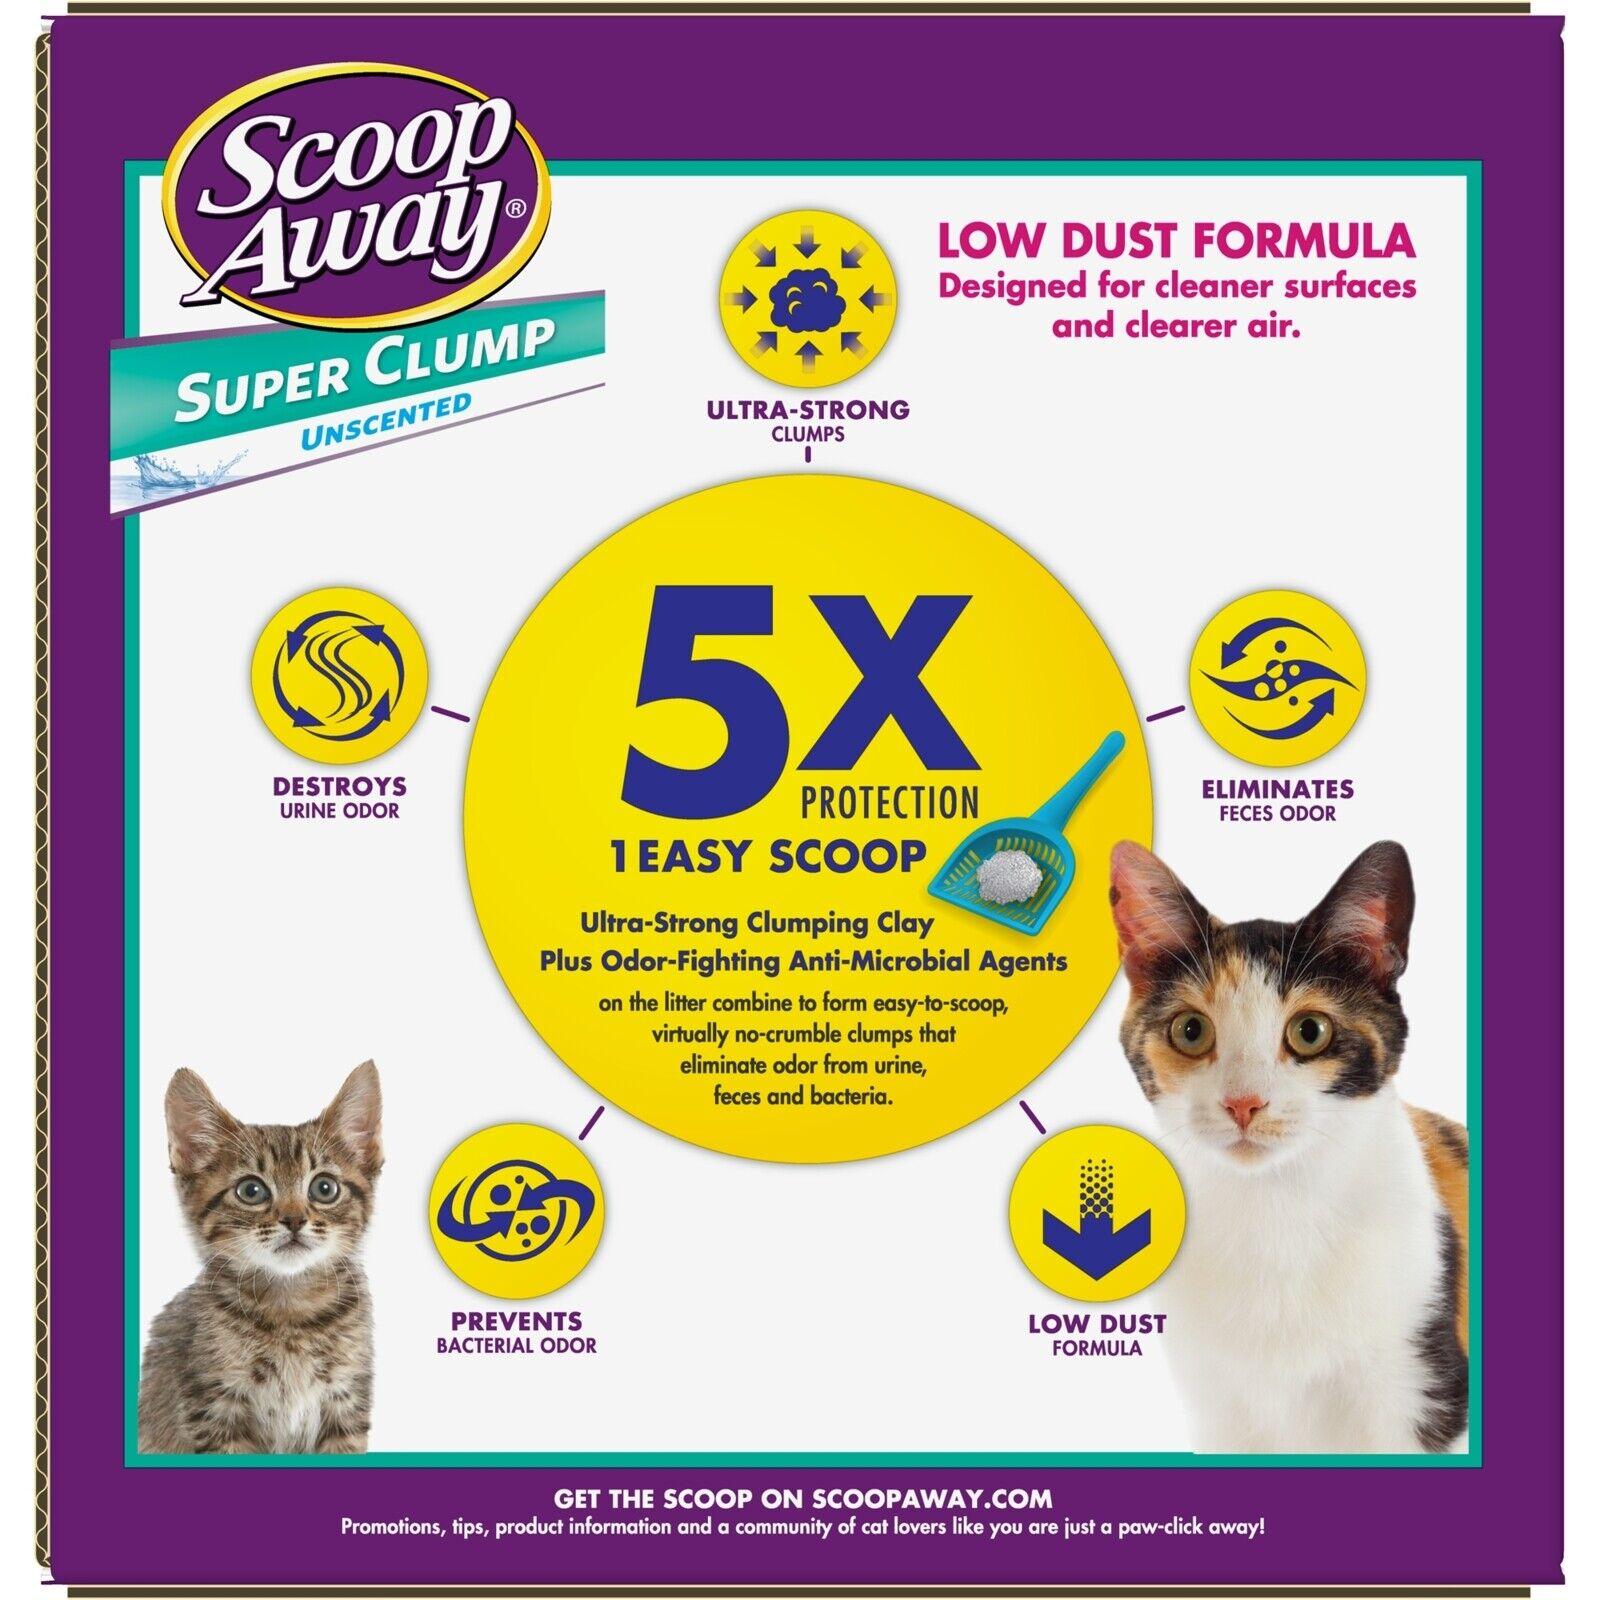 Scoop Away Super Clump, Unscented Cat Litter 100 LB (Pack of 4 x 25 Lb)